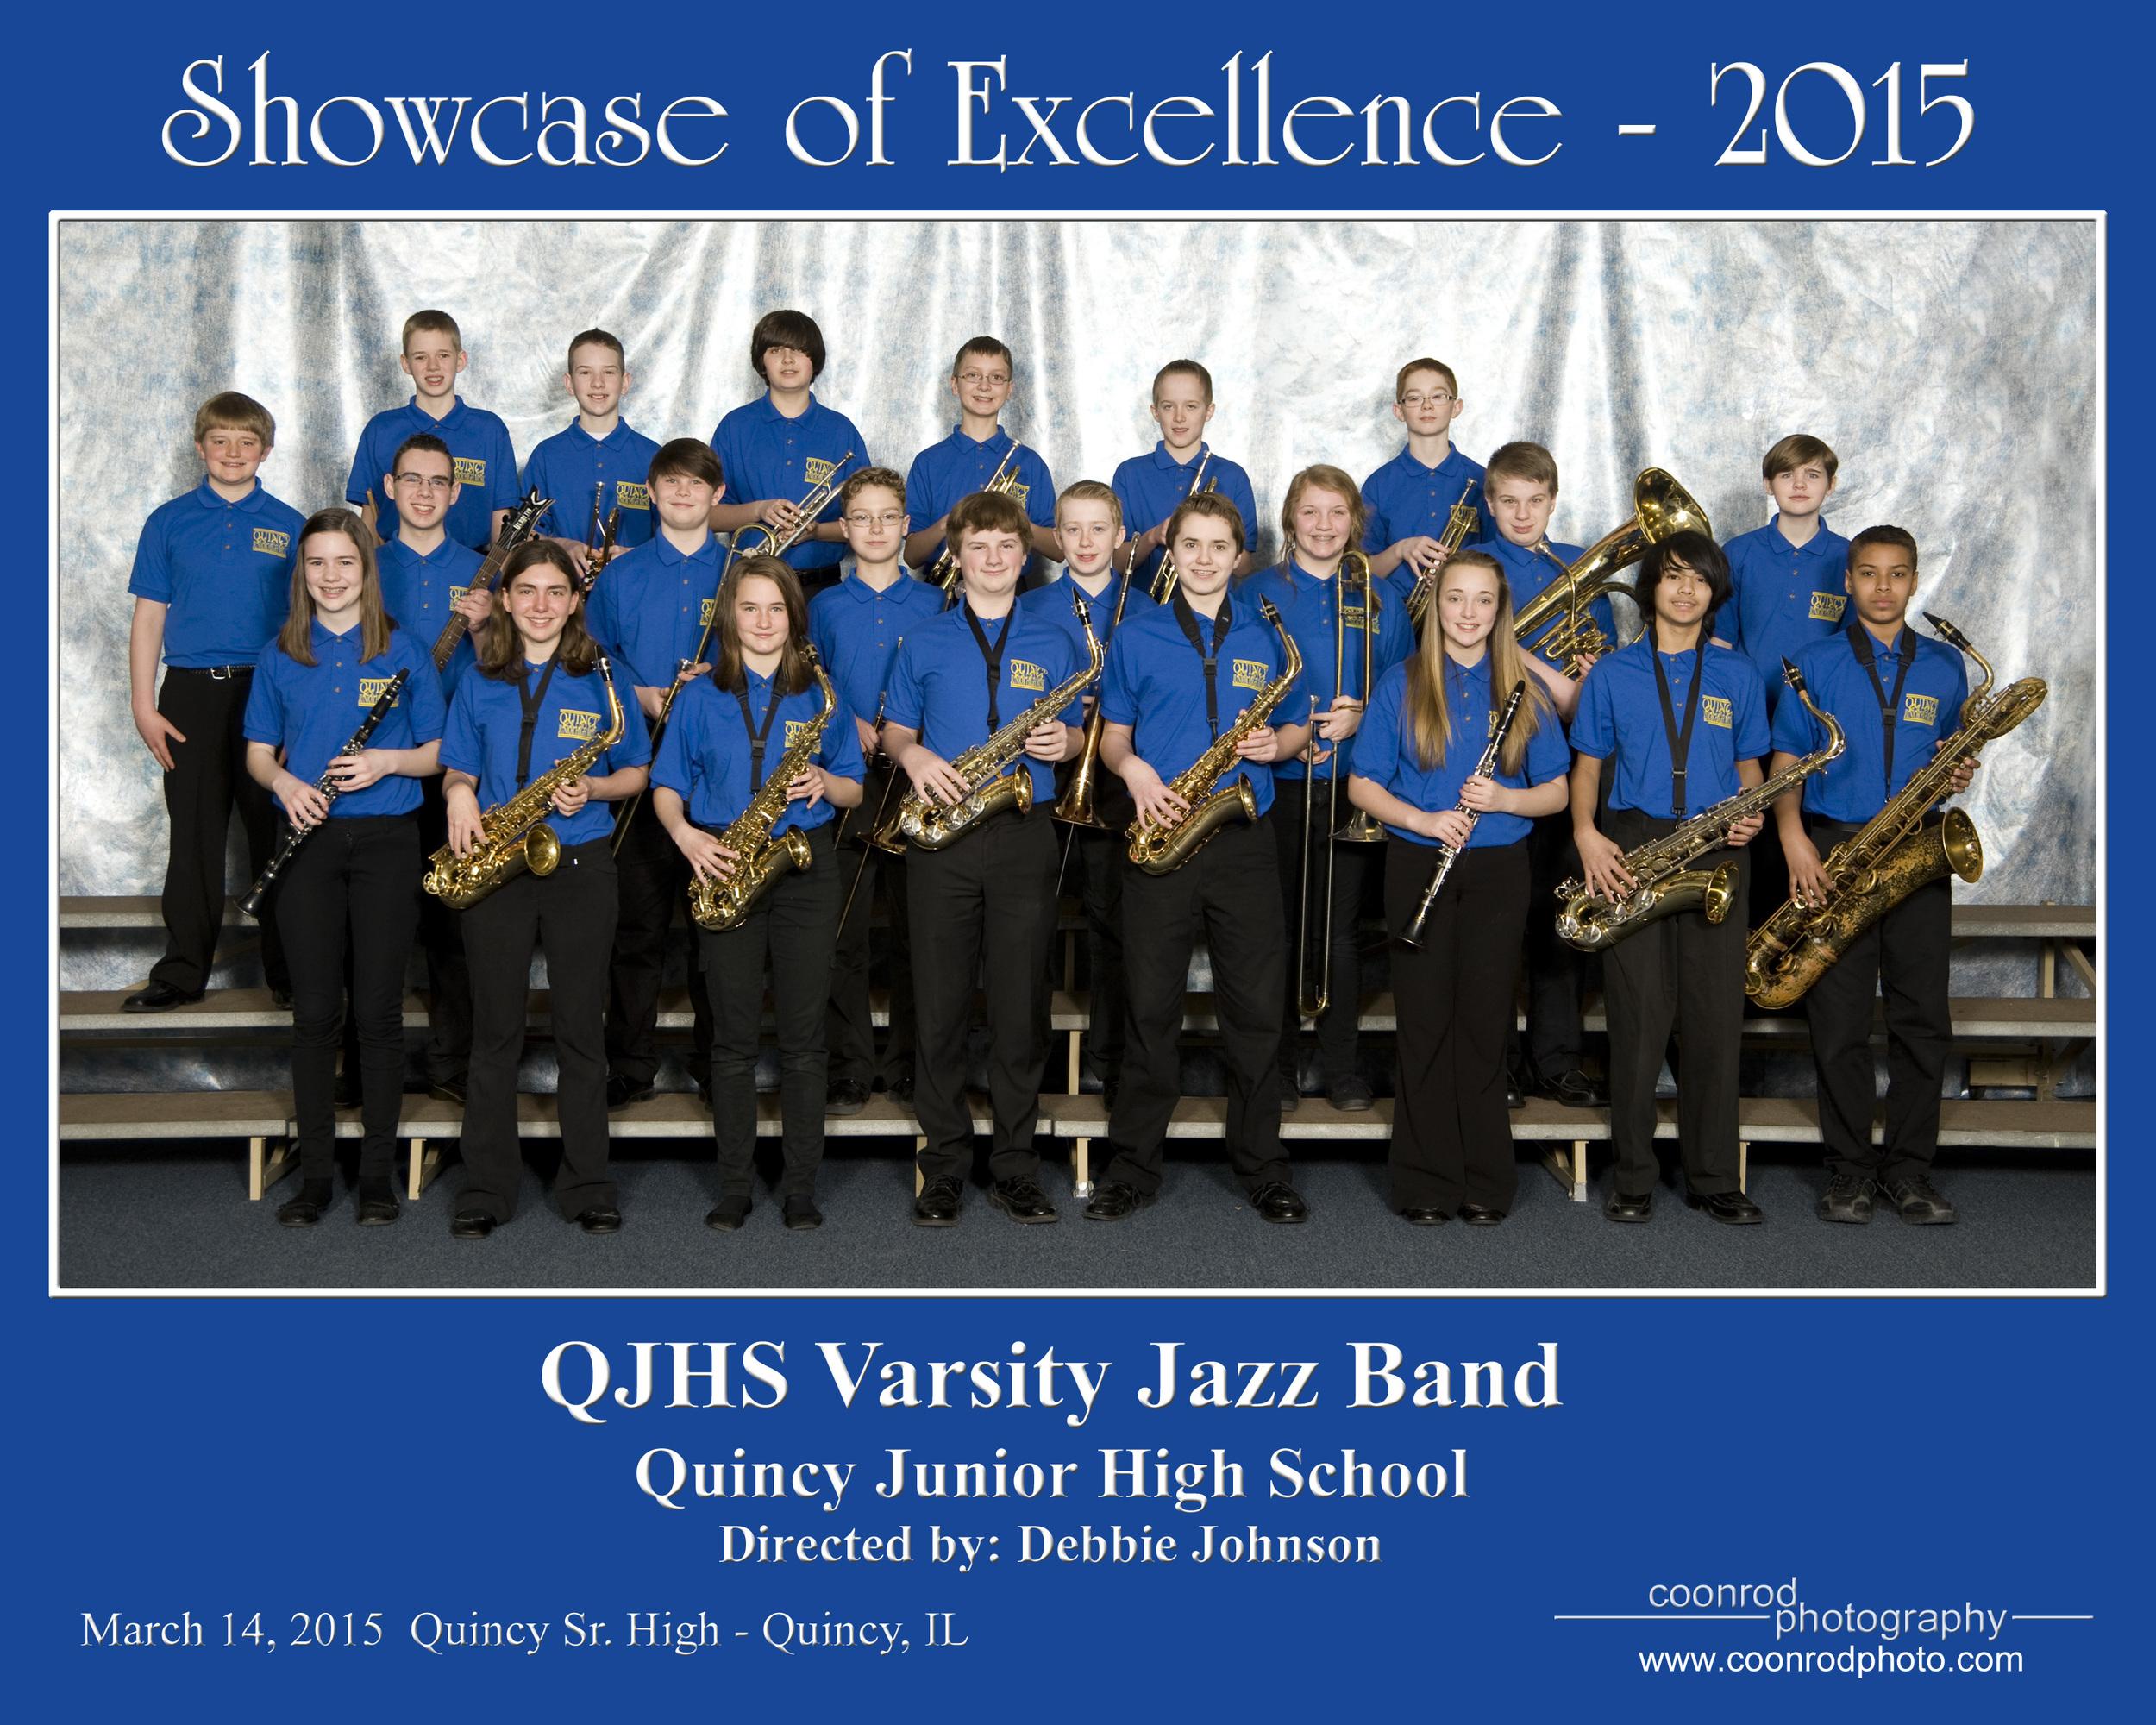 01 QJHS Varsity Jazz.jpg